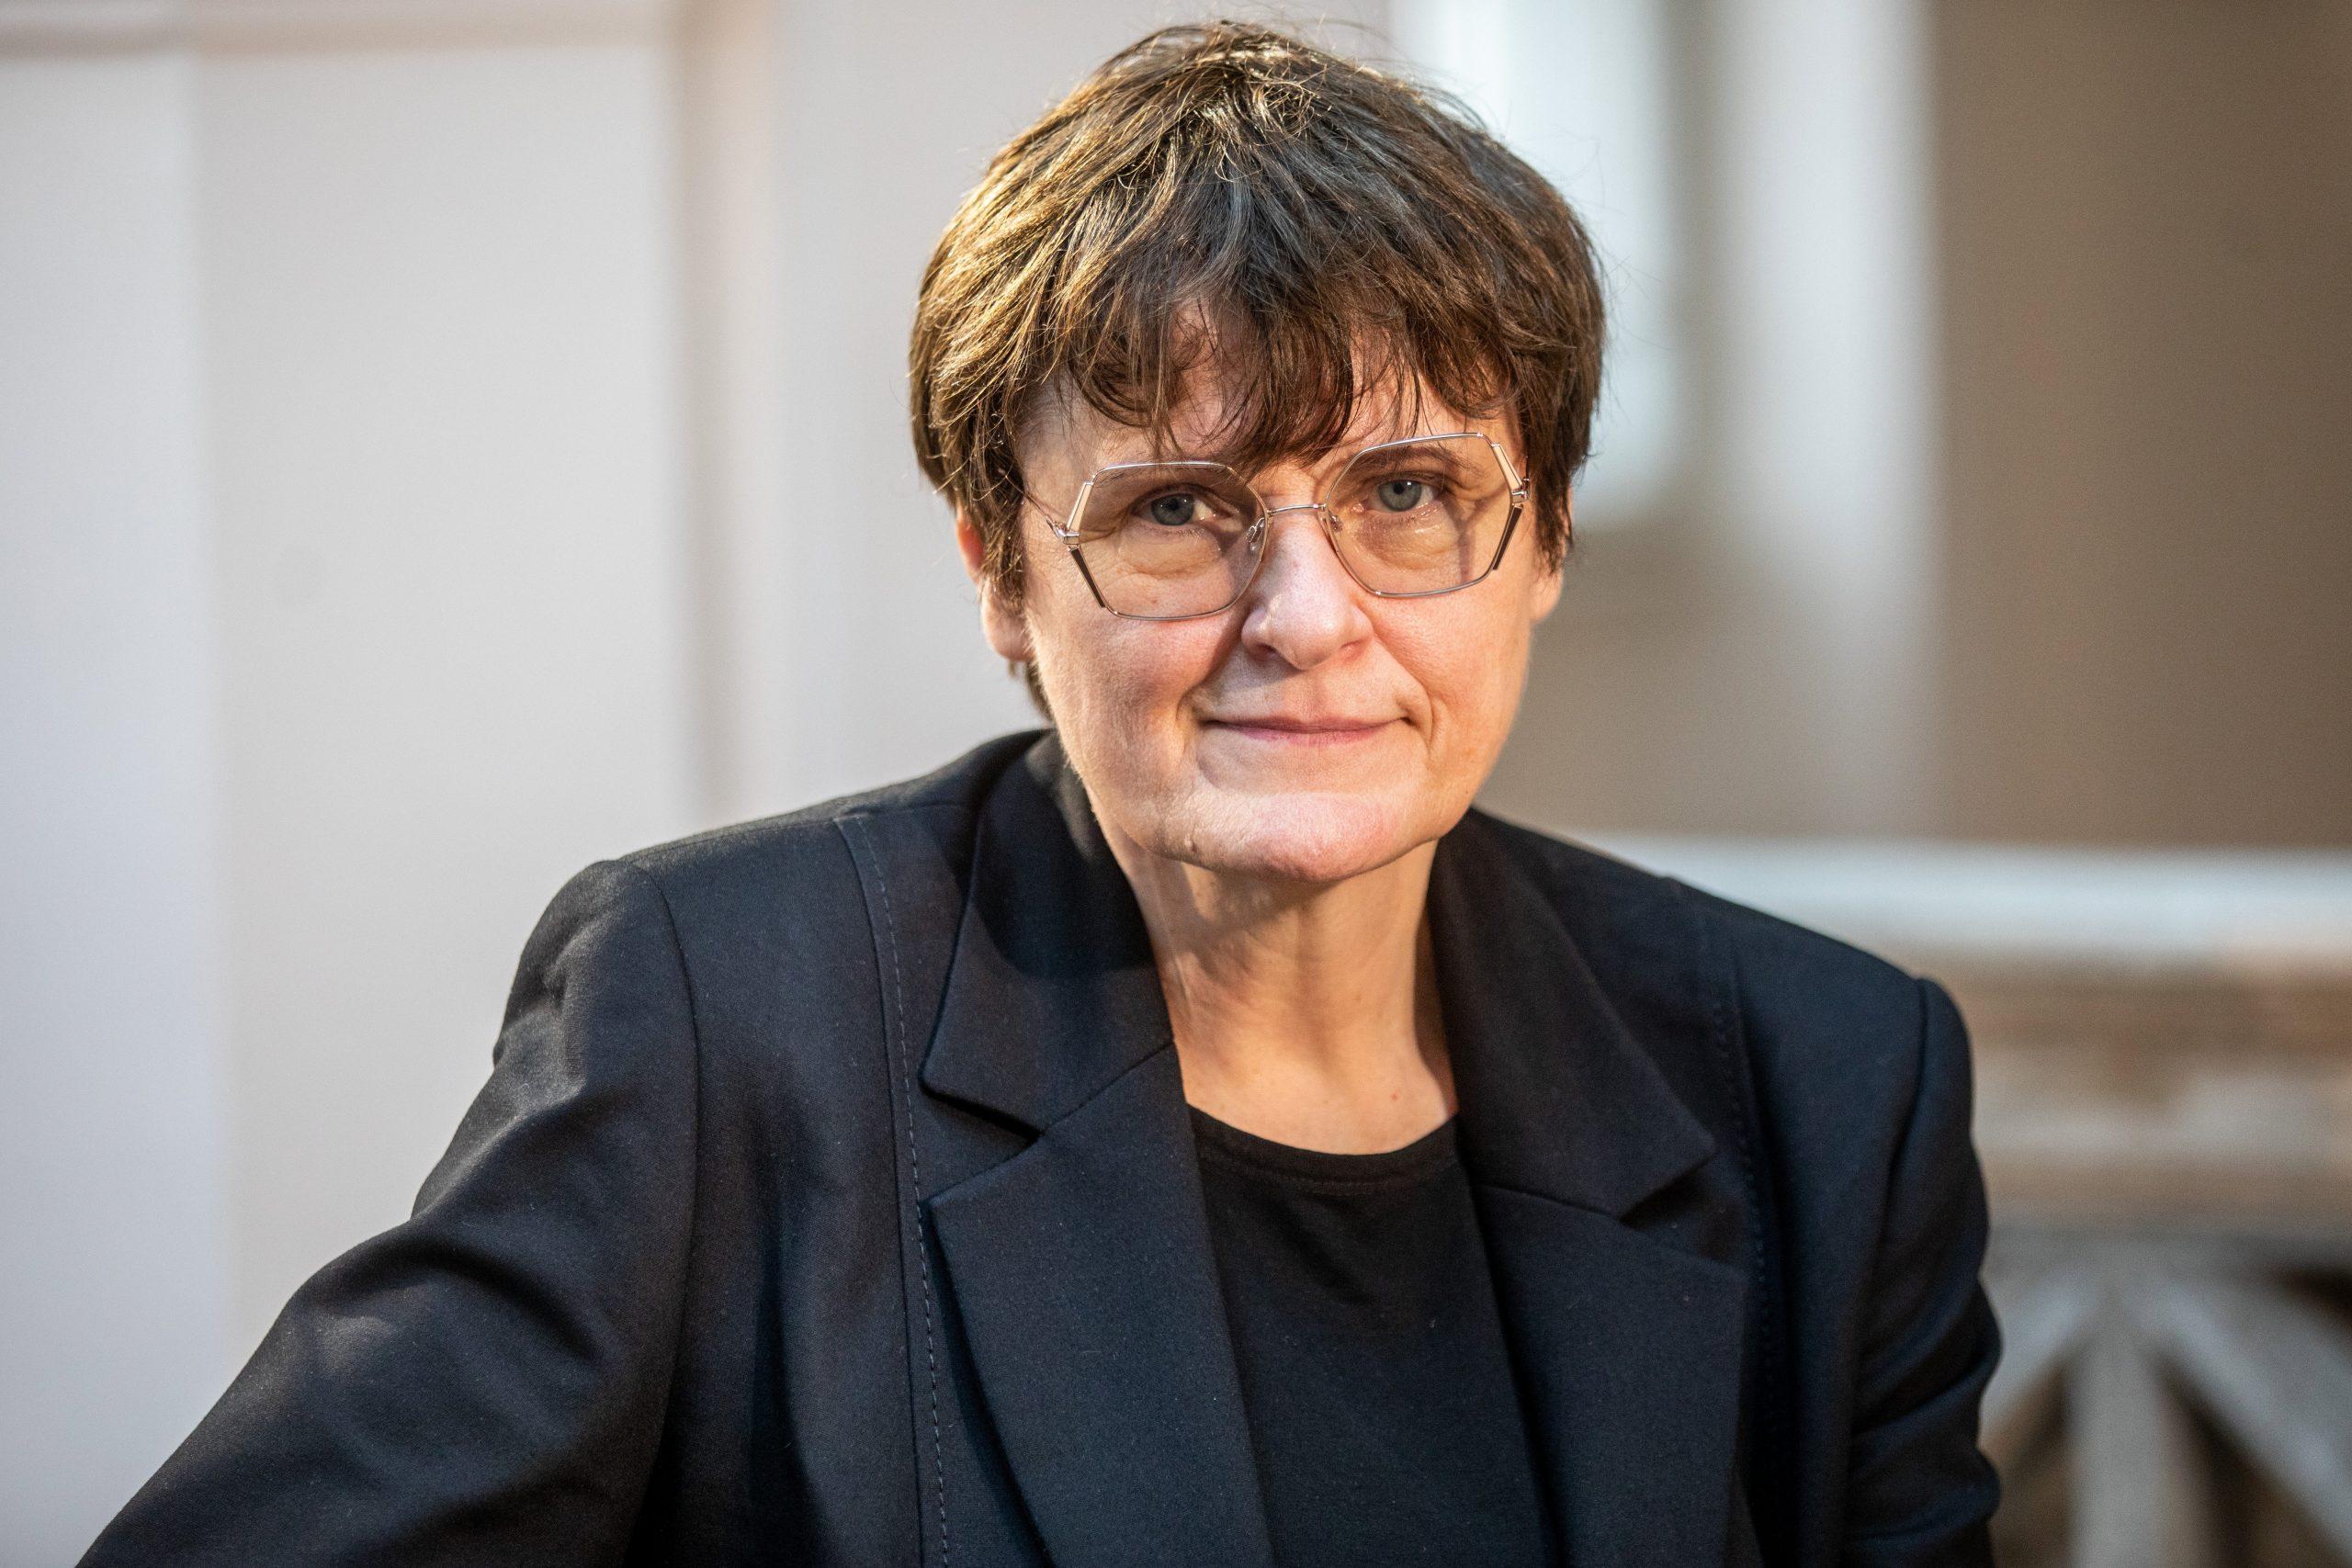 Katalin Karikó Visits Alma Mater, Receives Honorary Szeged Citizenship